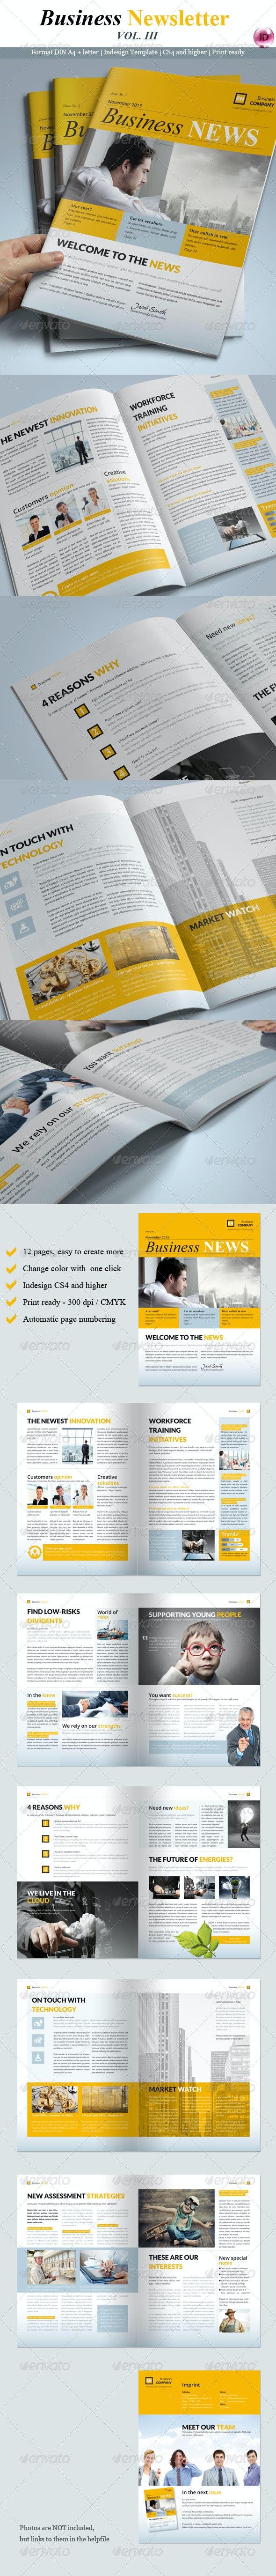 Business Newsletter Vol. III - Newsletters Print Templates